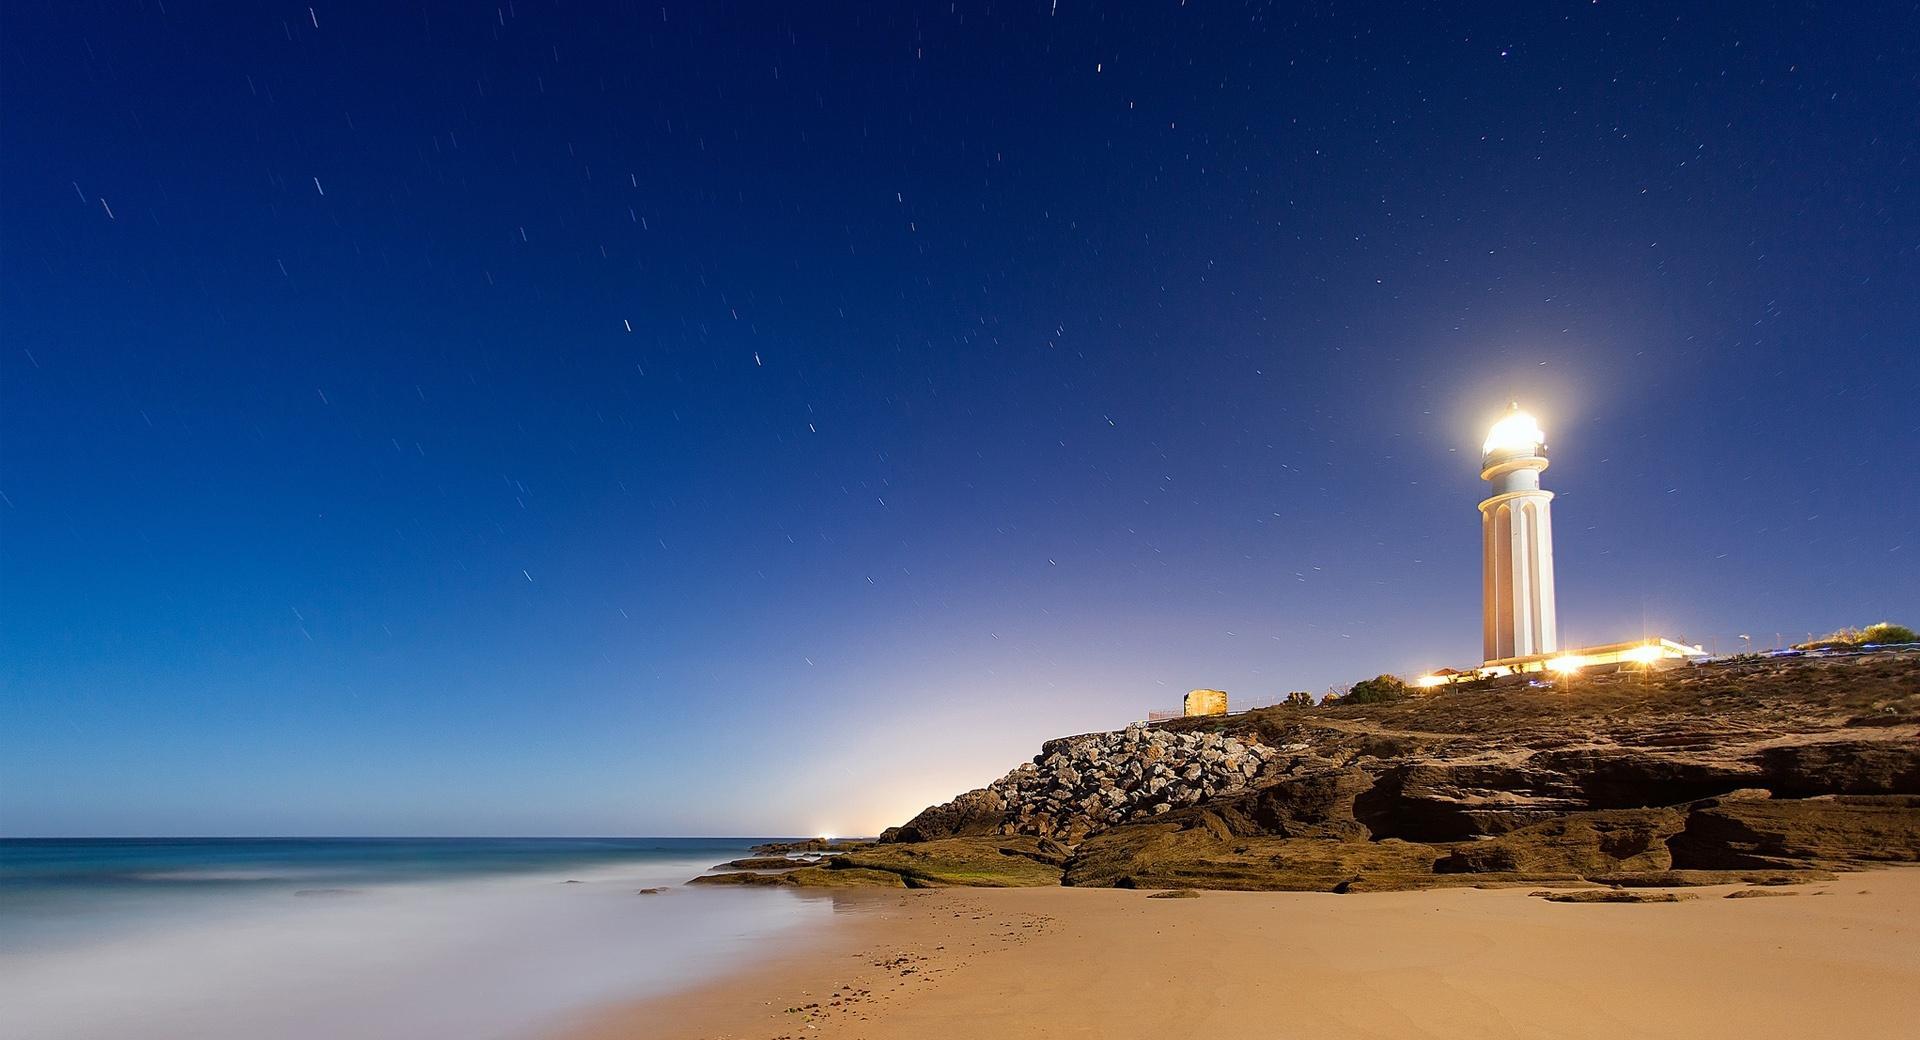 Cape Trafalgar Lighthouse wallpapers HD quality